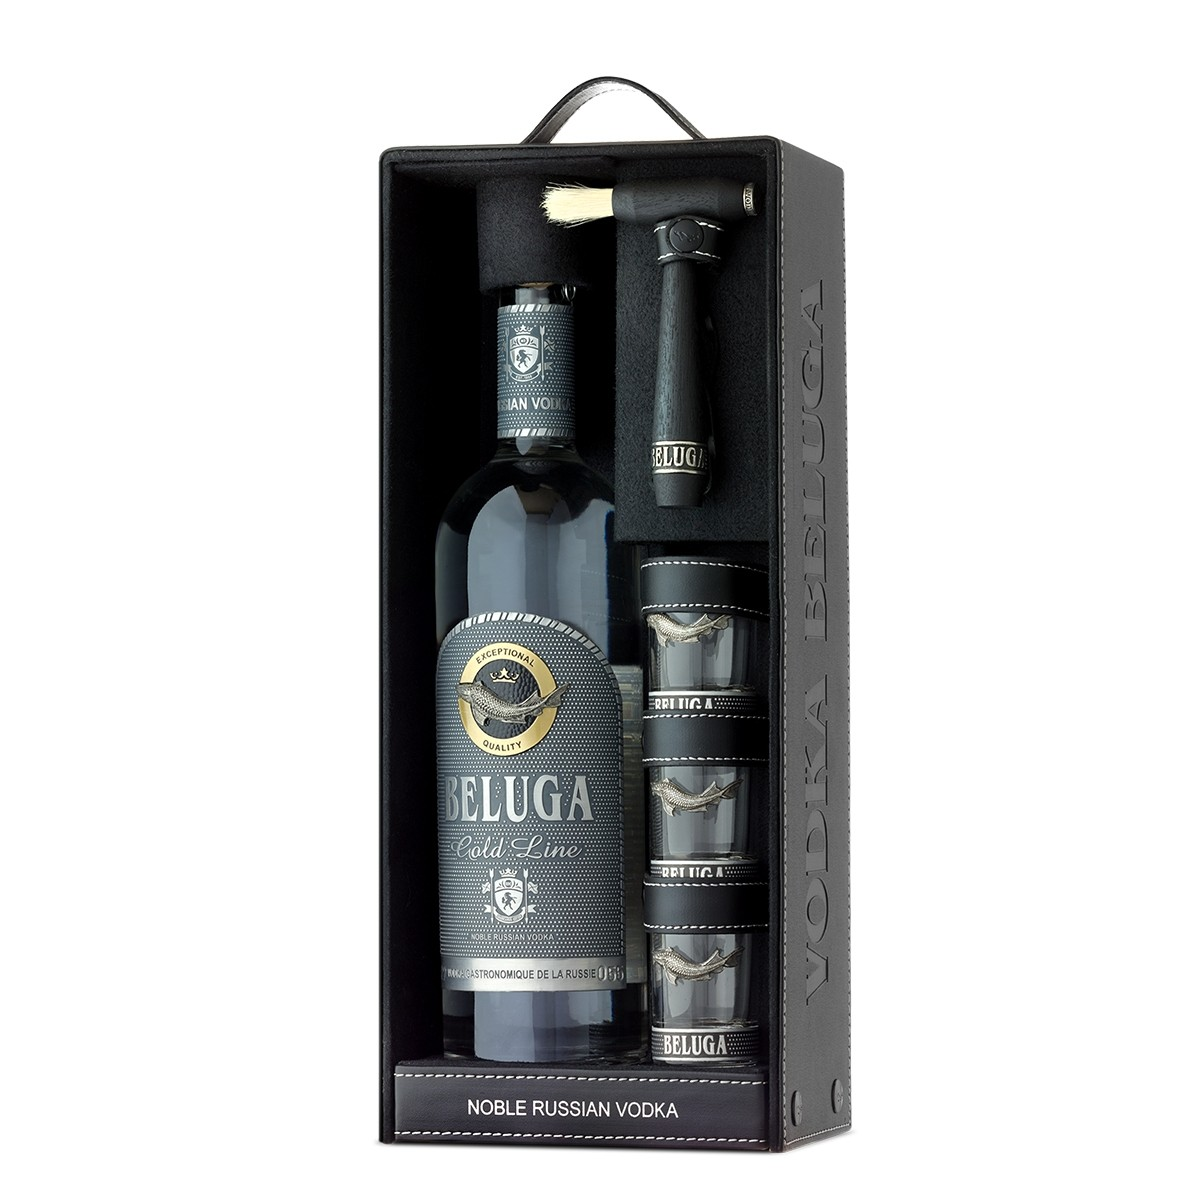 Beluga Gold Line 700 ml + 3 shots